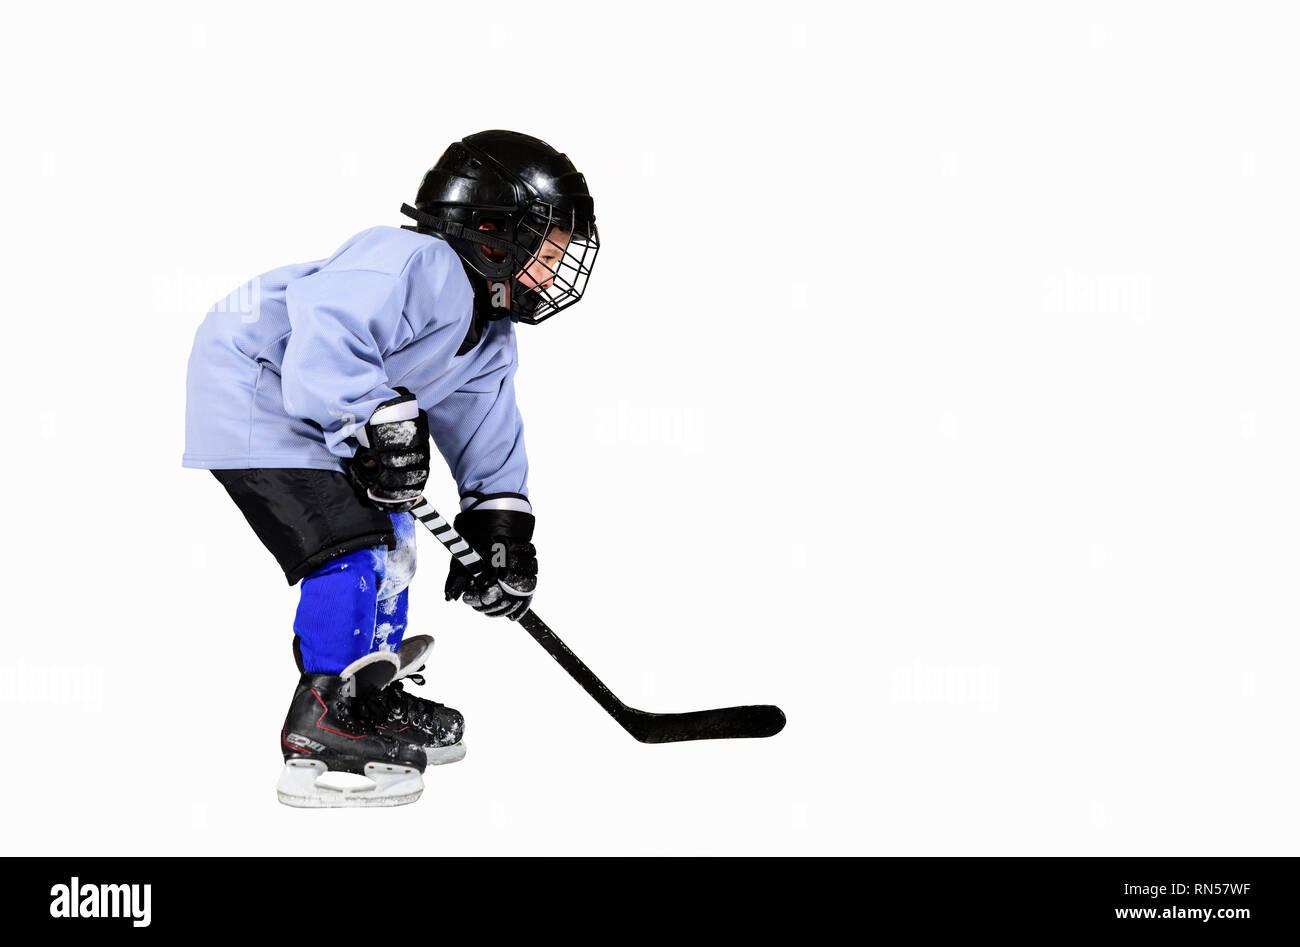 Ice Hockey Equipment Stock Photos & Ice Hockey Equipment Stock